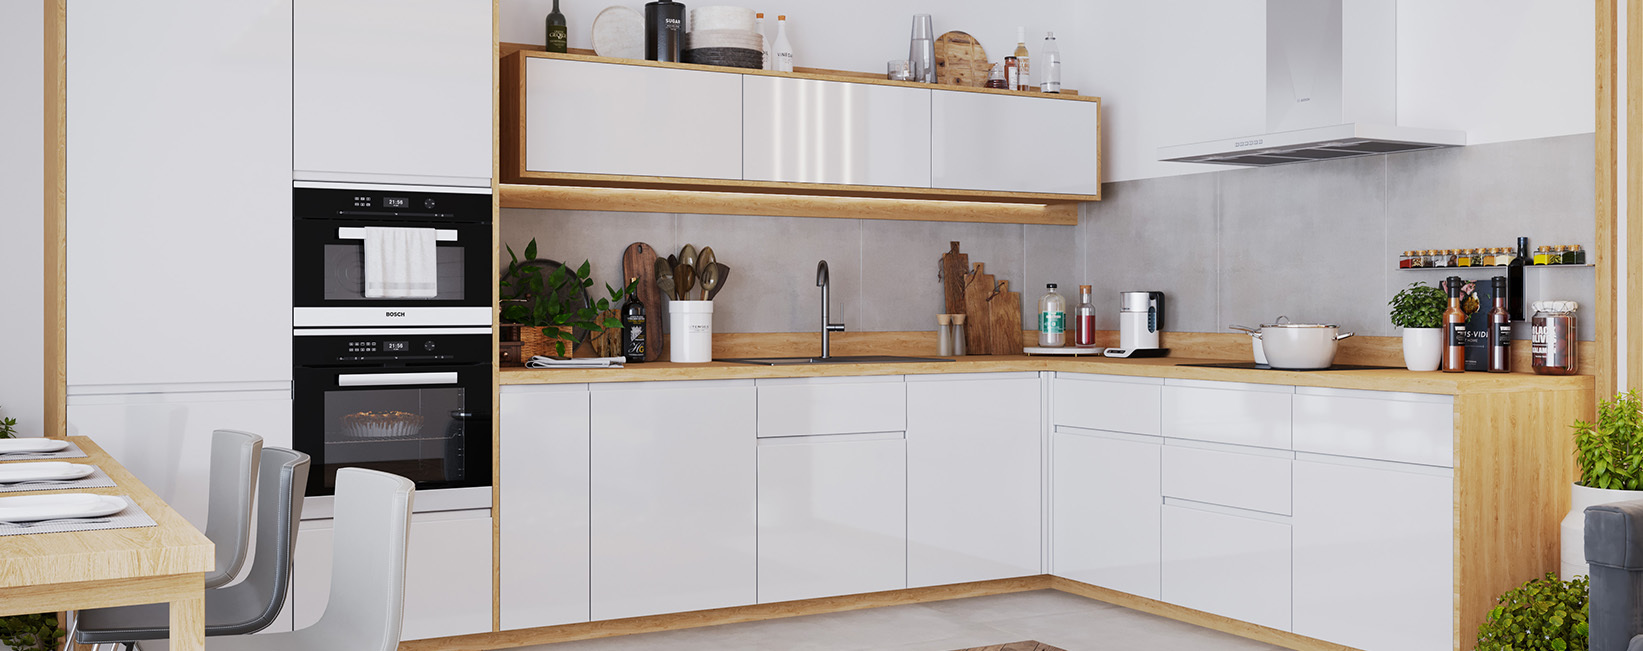 Meble Kuchenne Salony Meblowe Agata